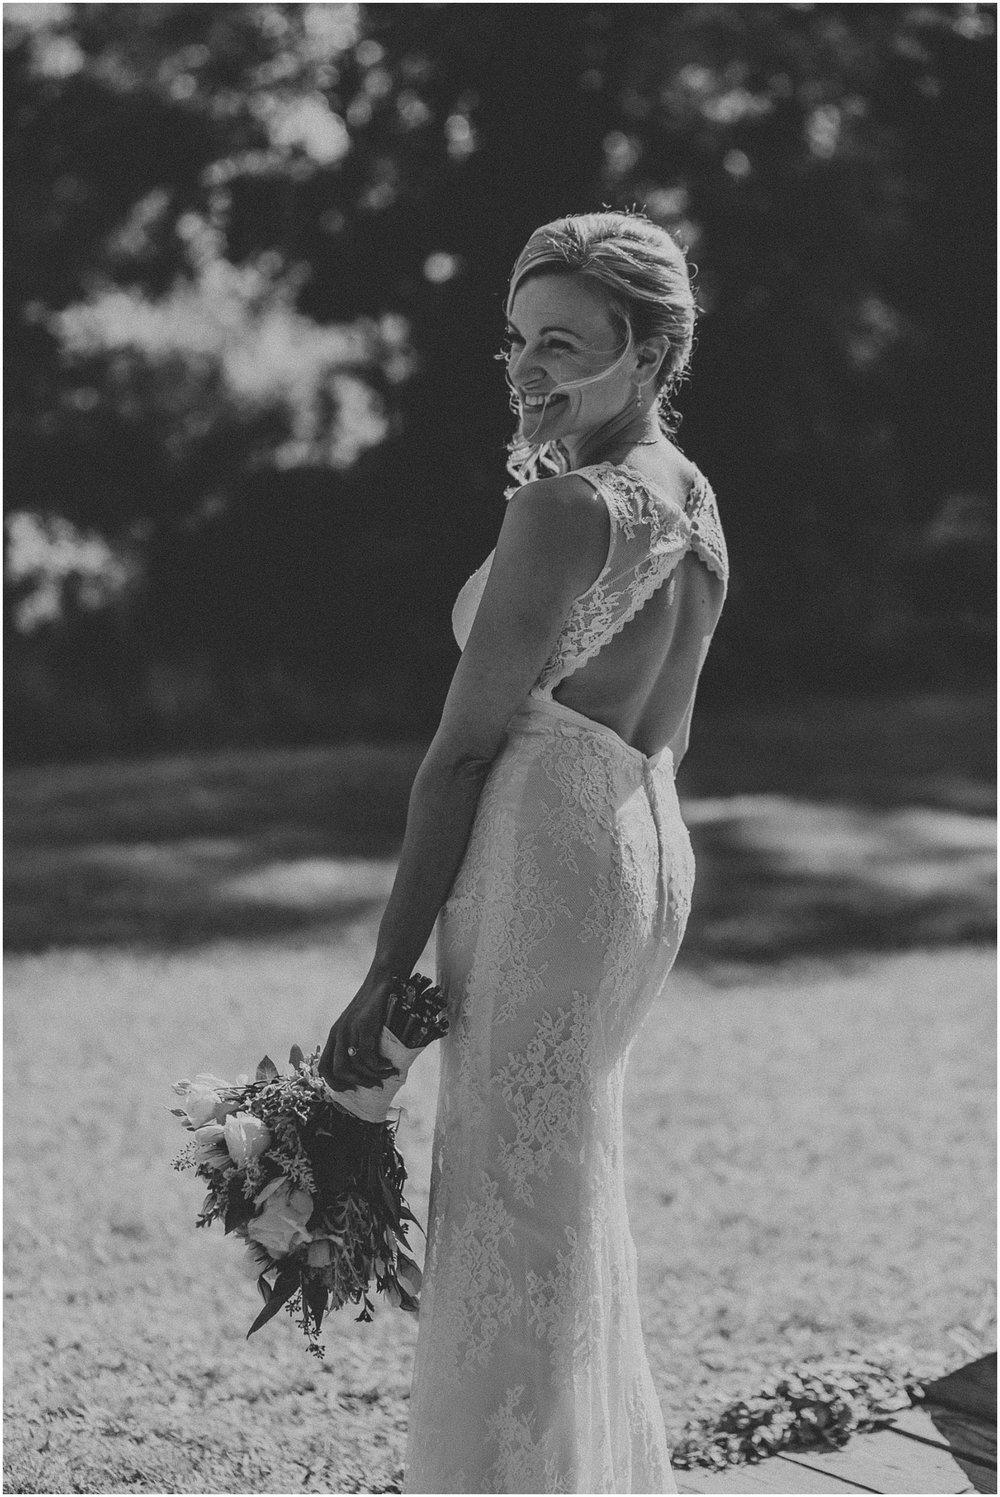 waterloo-village-waterloo village-wedding-outdoor wedding-rustic-boemian-new jersey-bride-groom-wedding party-davids bridal-wedding dress-wedding-first kiss-intimate wedding_0364.jpg